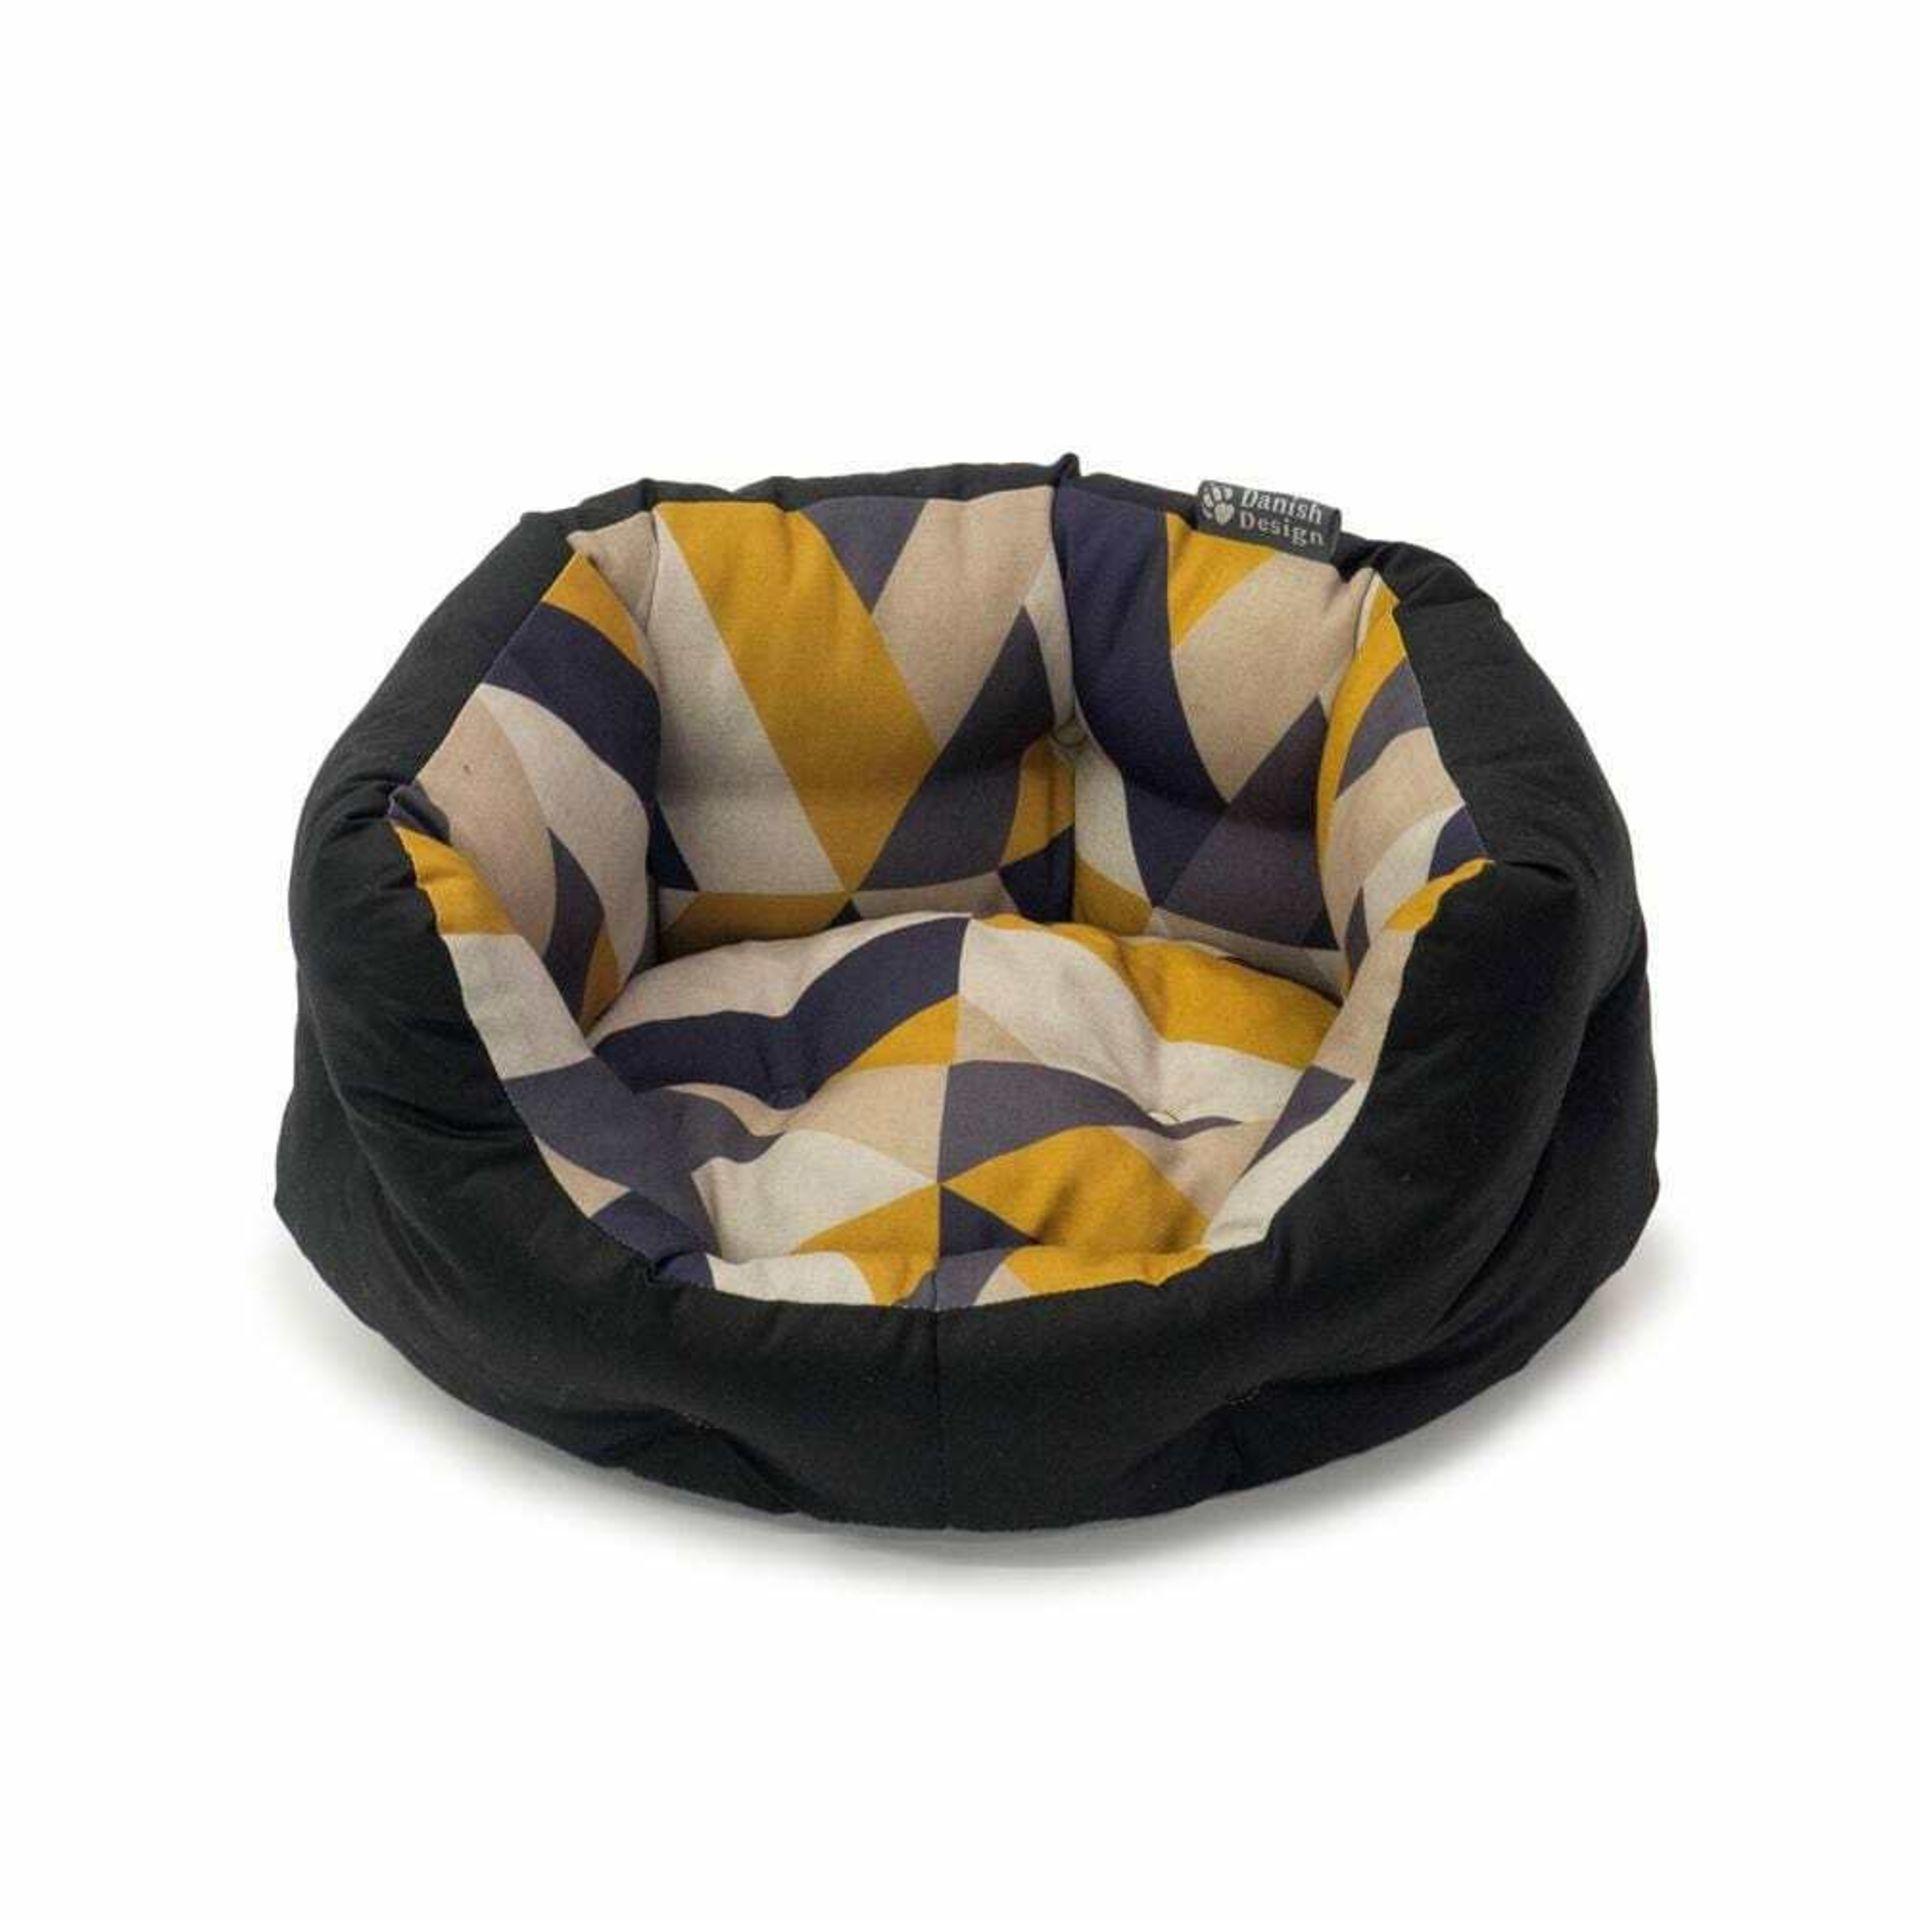 Danish Design Retreat Eco-Wellness Geo Tile Luxury Dog Bed Medium